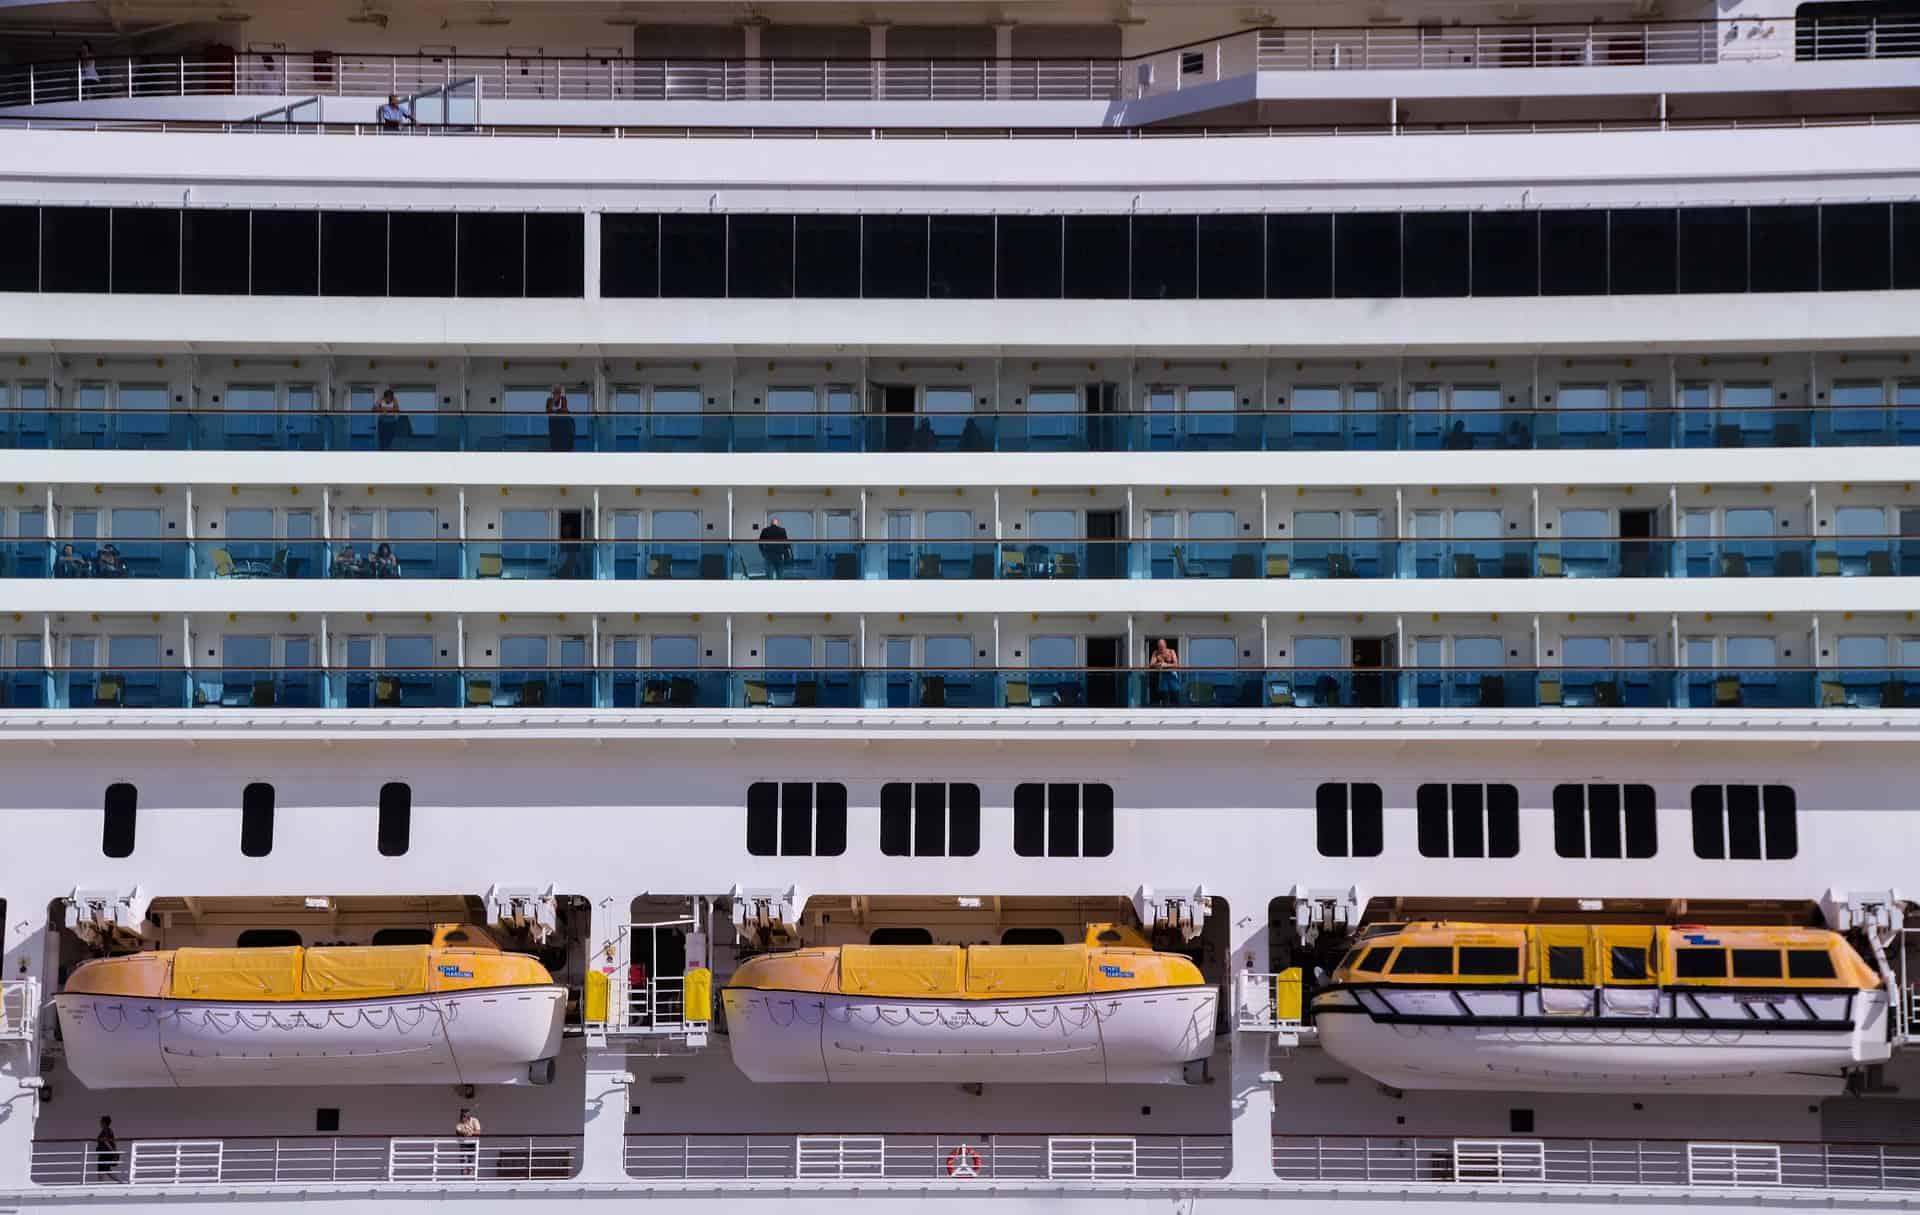 Size matters when cruising